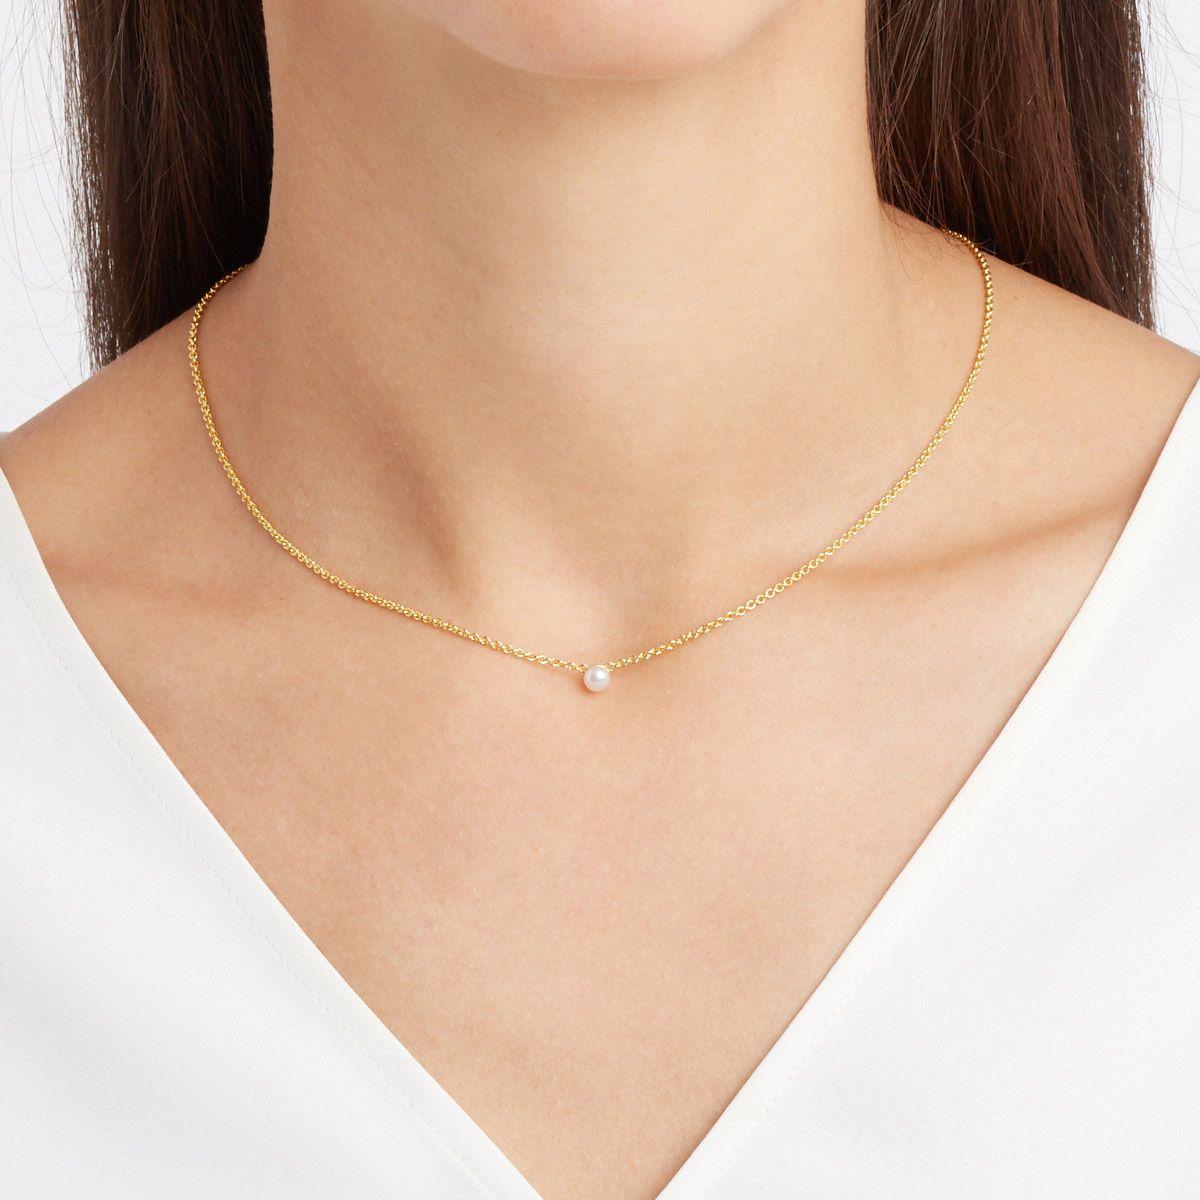 Sinja - Perlenketten - Silber